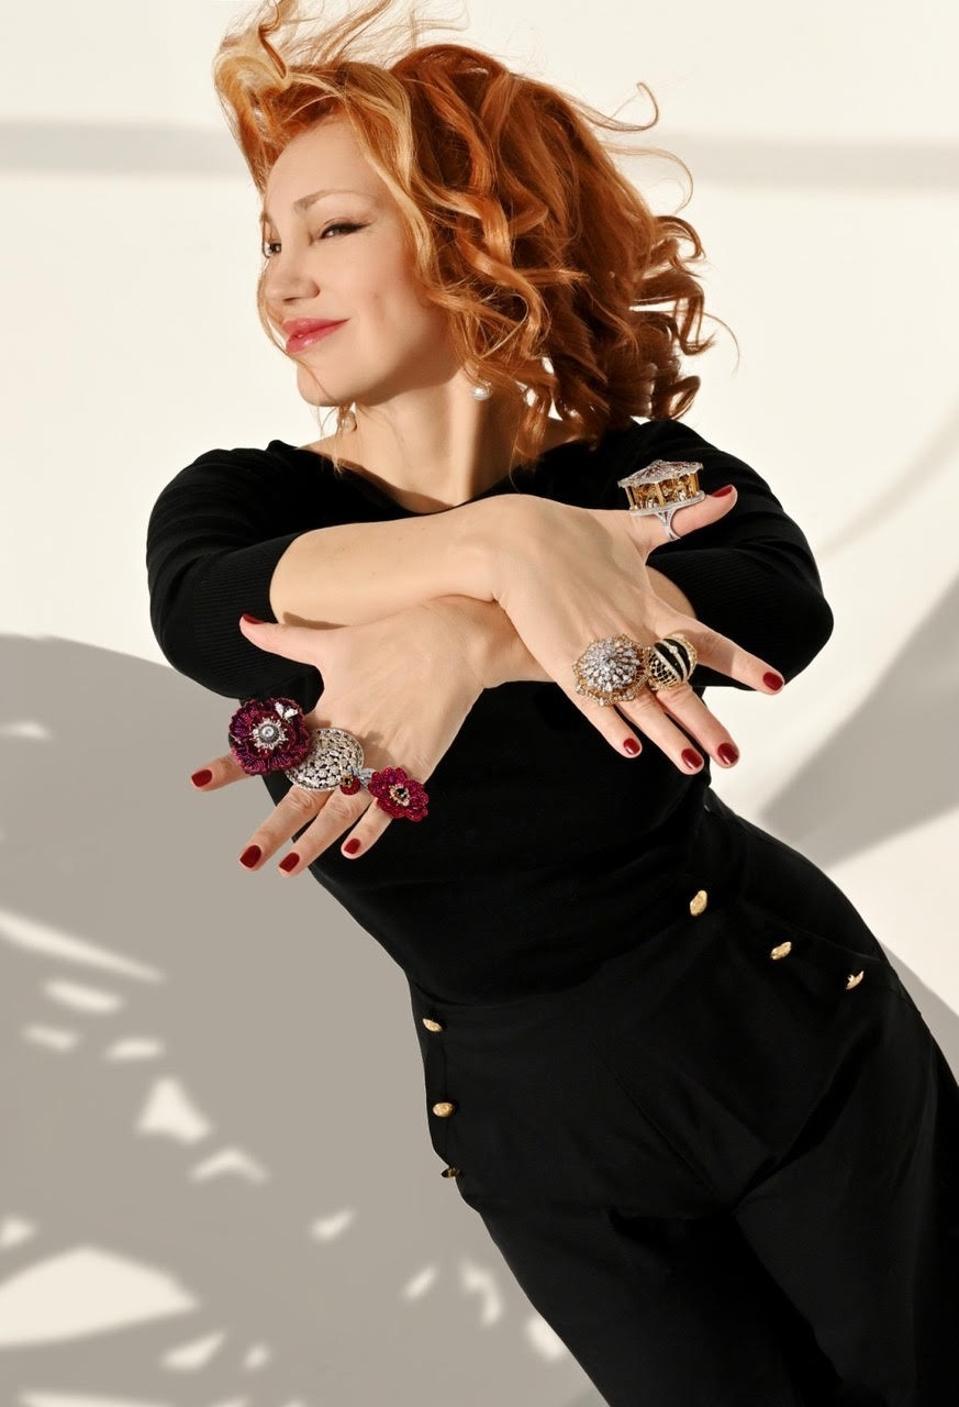 Margarita Prykhodko, founder and creative director of London-based Sybarite Jewellery